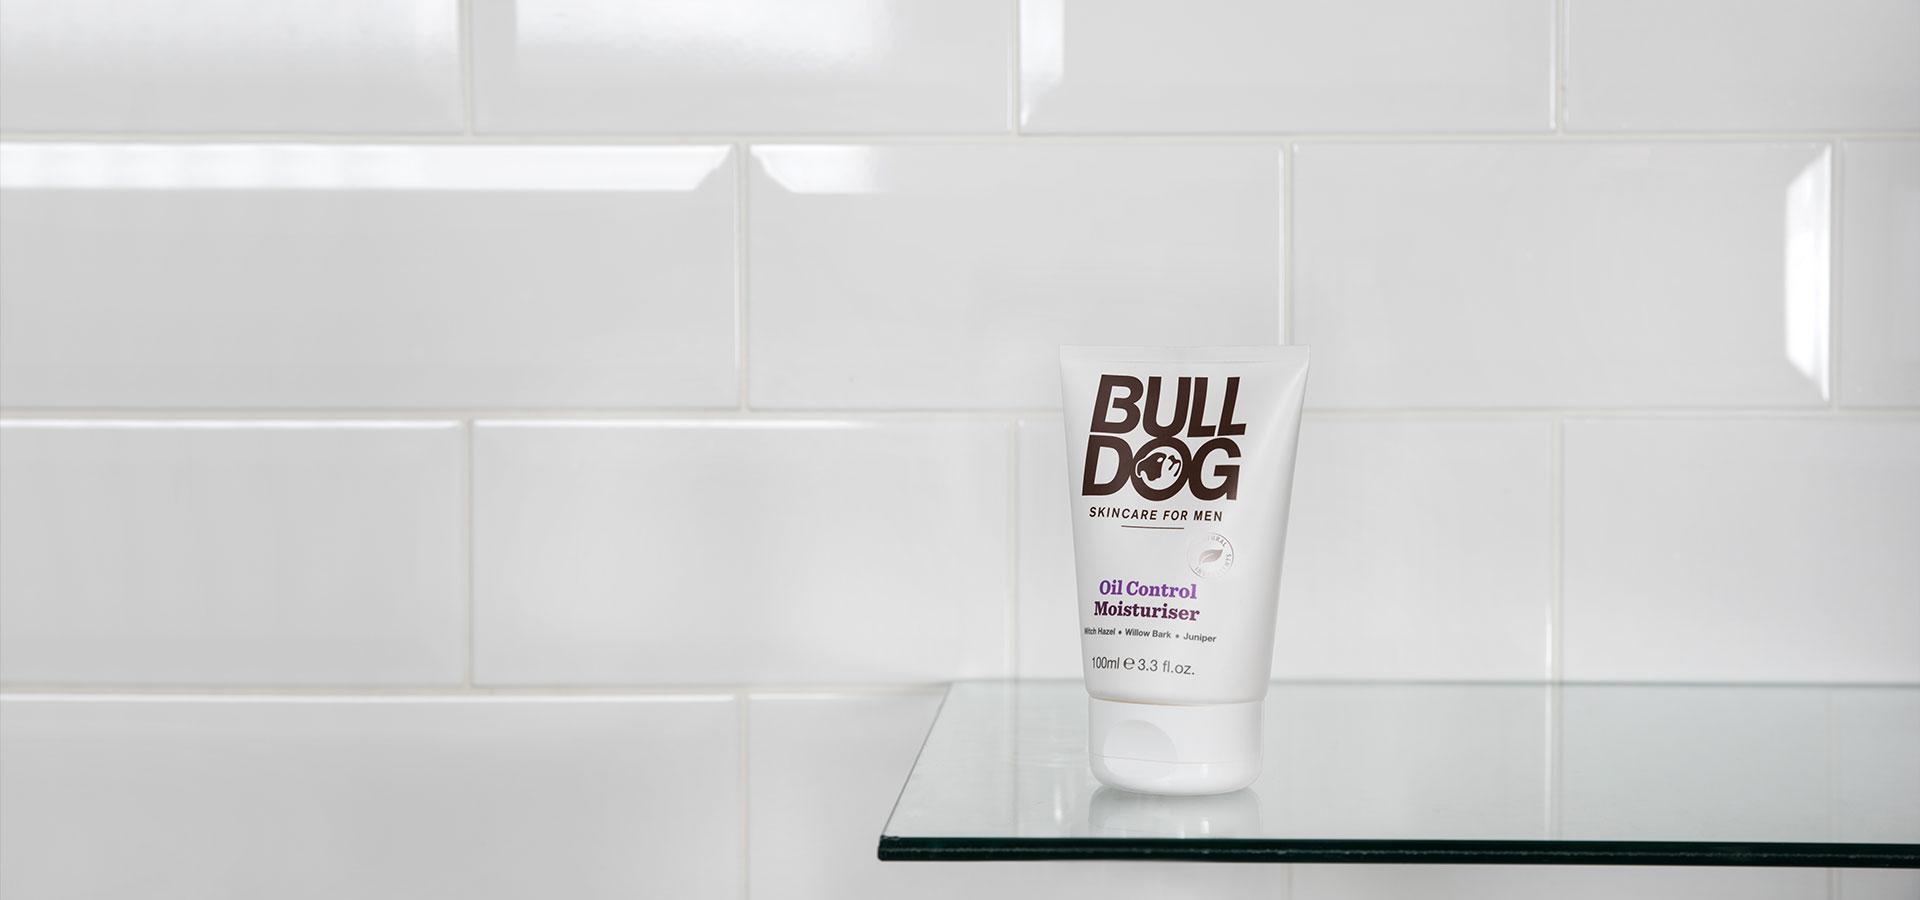 Kem Dưỡng Ẩm Bulldog Oil Control Moisturiser 100ml Cho Nam Da Dầu